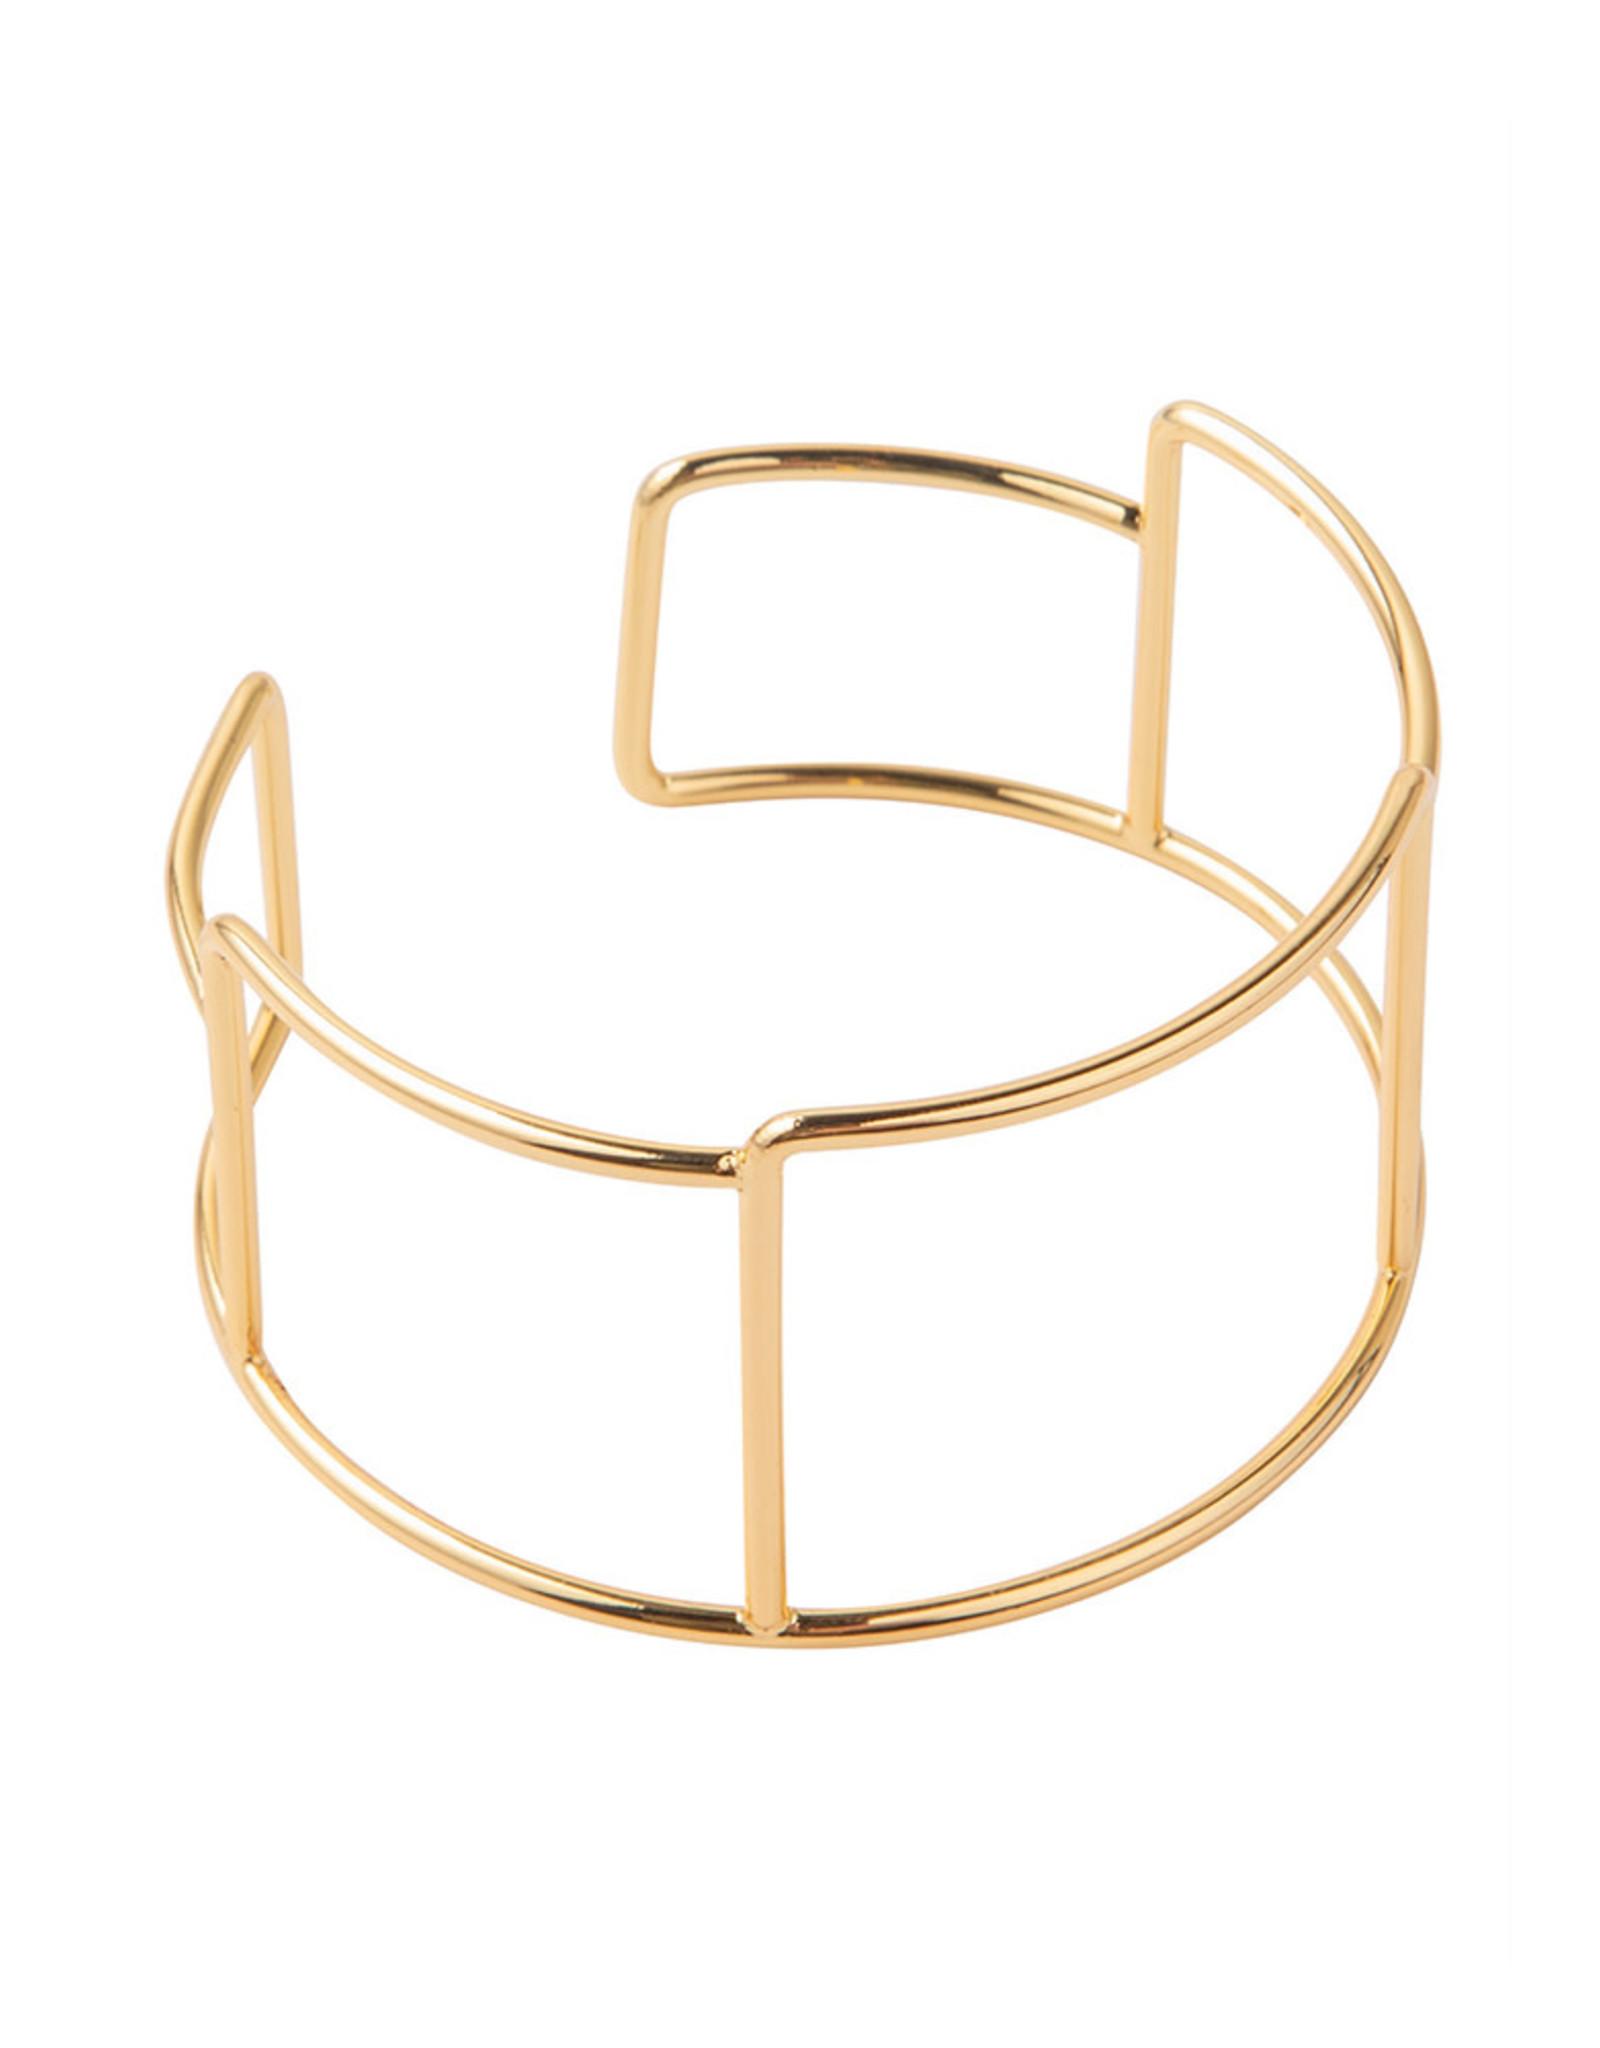 Ellen Beekmans Armband Bangle Block-gold